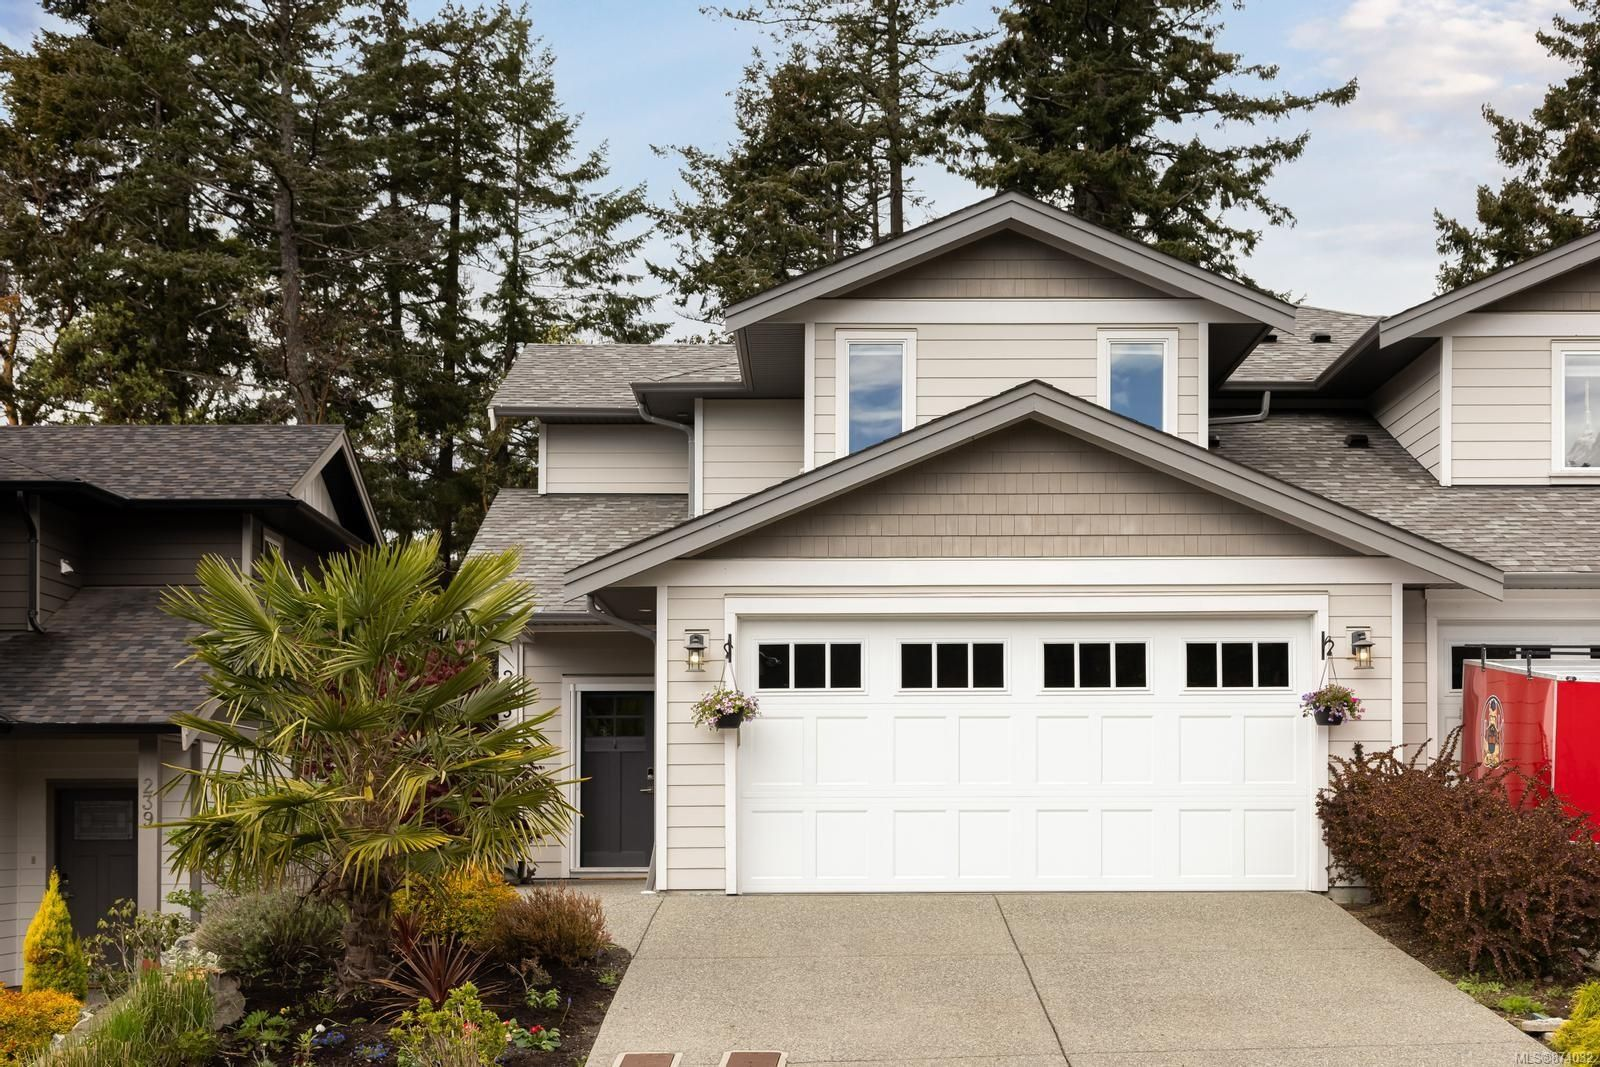 Main Photo: 235 Bellamy Link in : La Thetis Heights Half Duplex for sale (Langford)  : MLS®# 874032